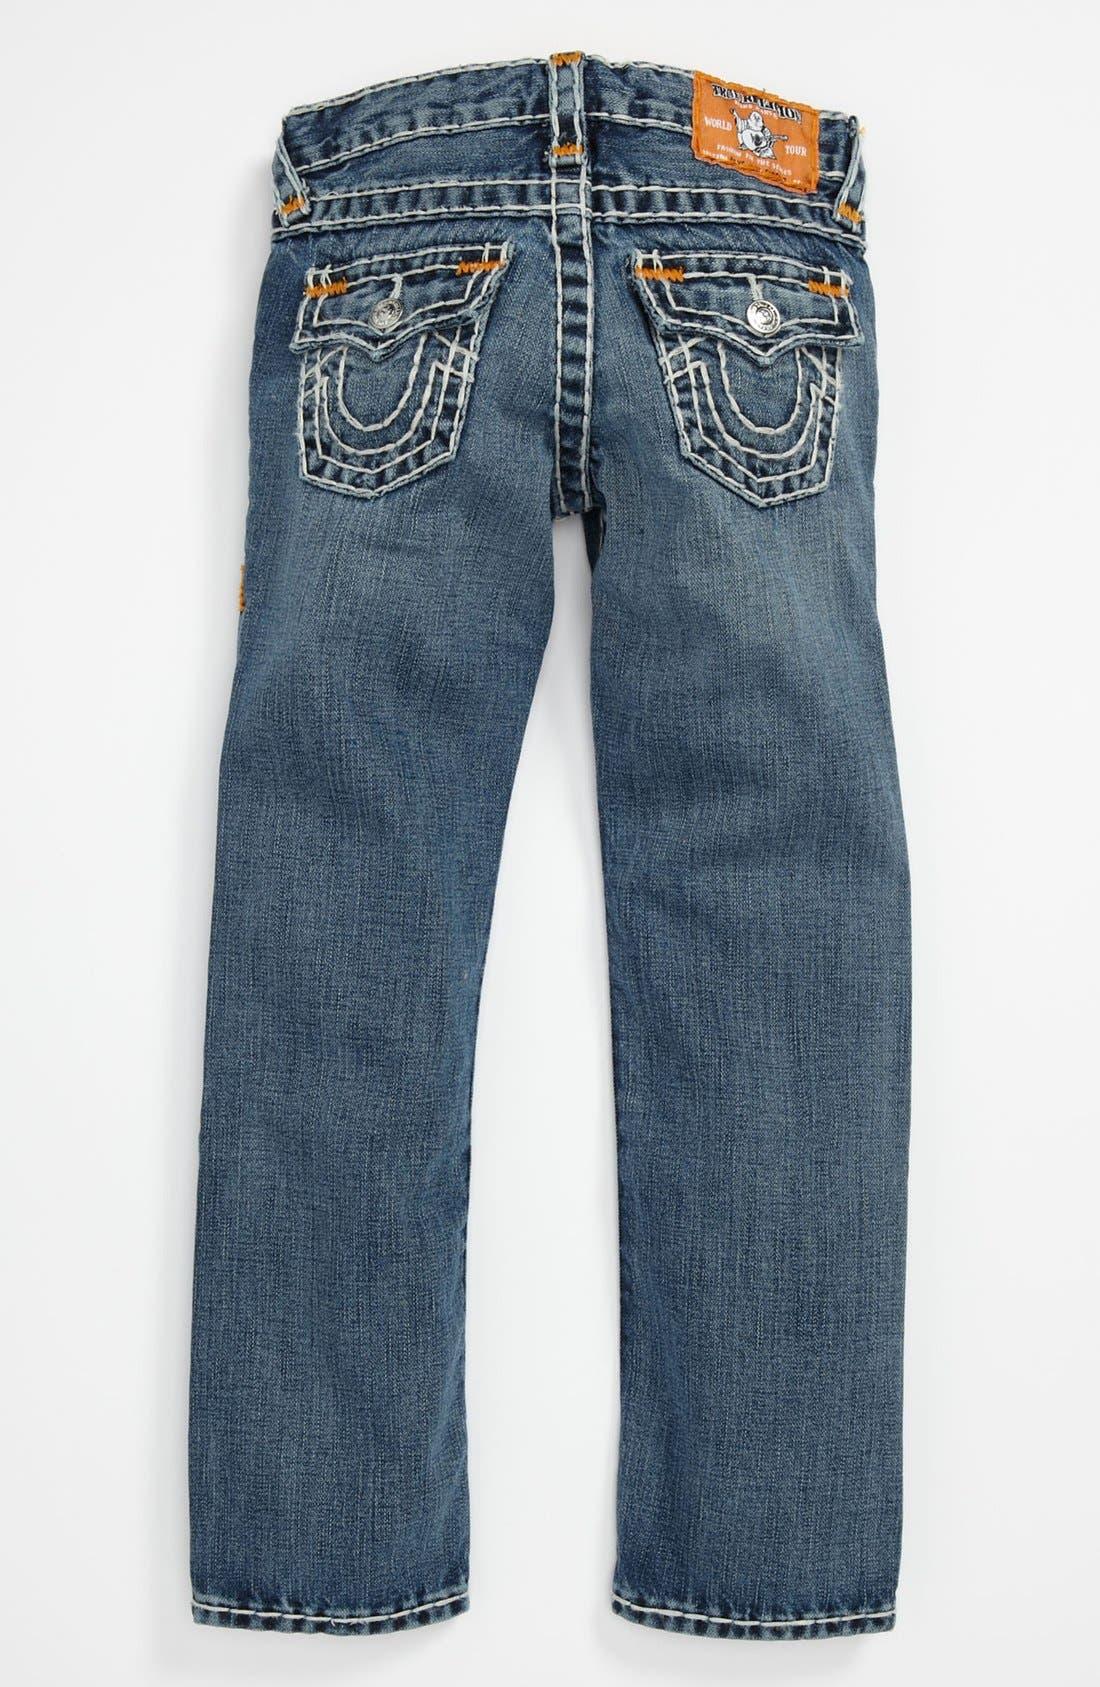 Main Image - True Religion Brand Jeans 'Jack Super T' Straight Leg Jeans (Little Boys & Big Boys)